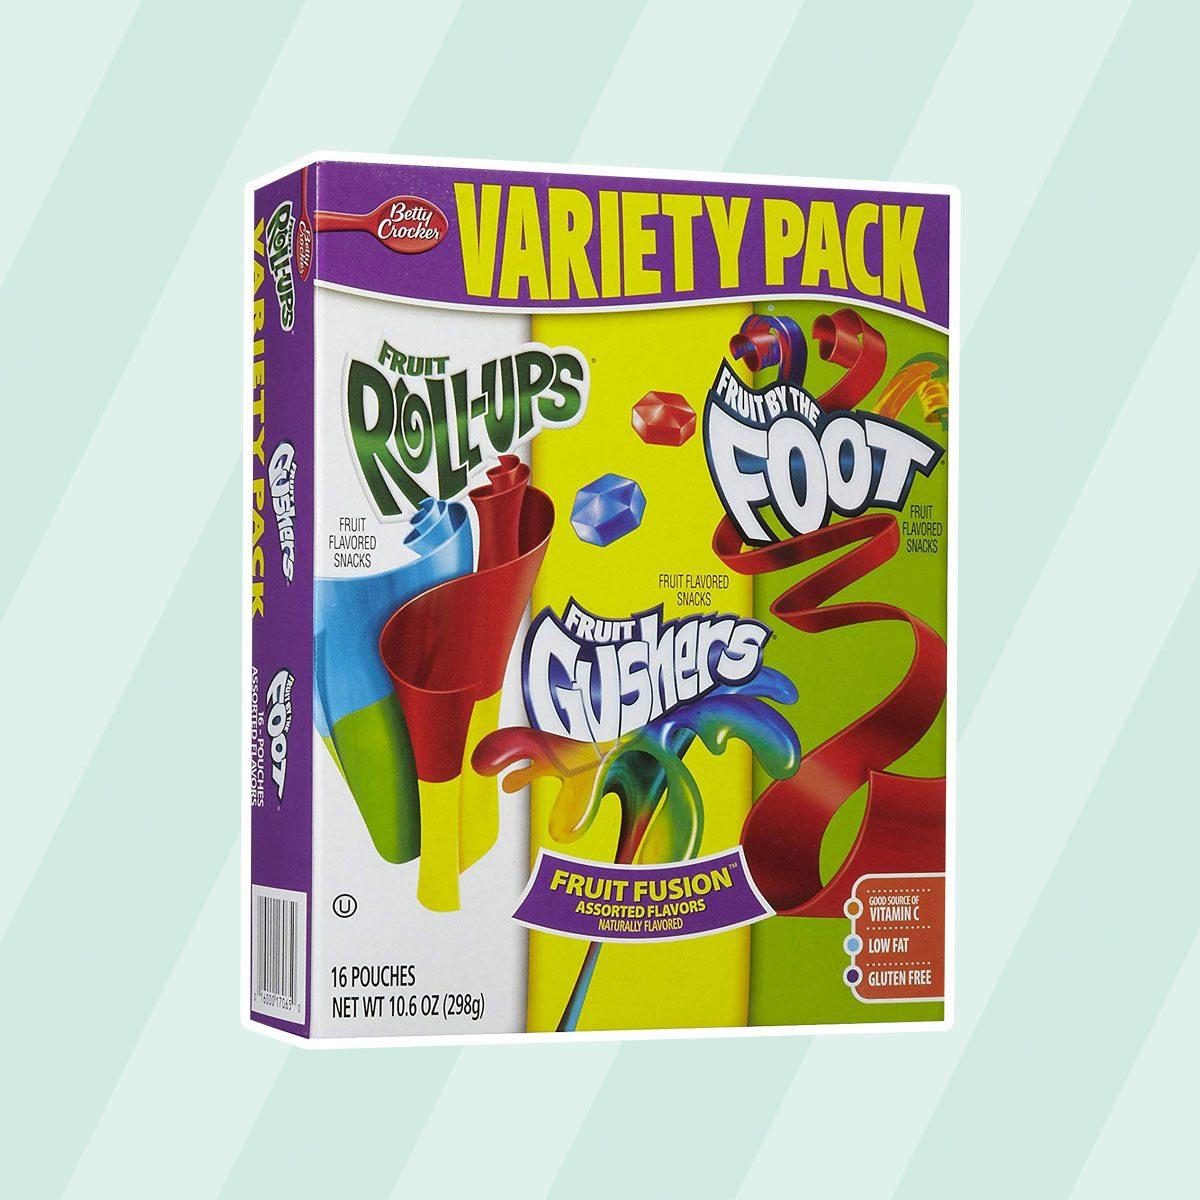 Fruit Snacks Variety Pack